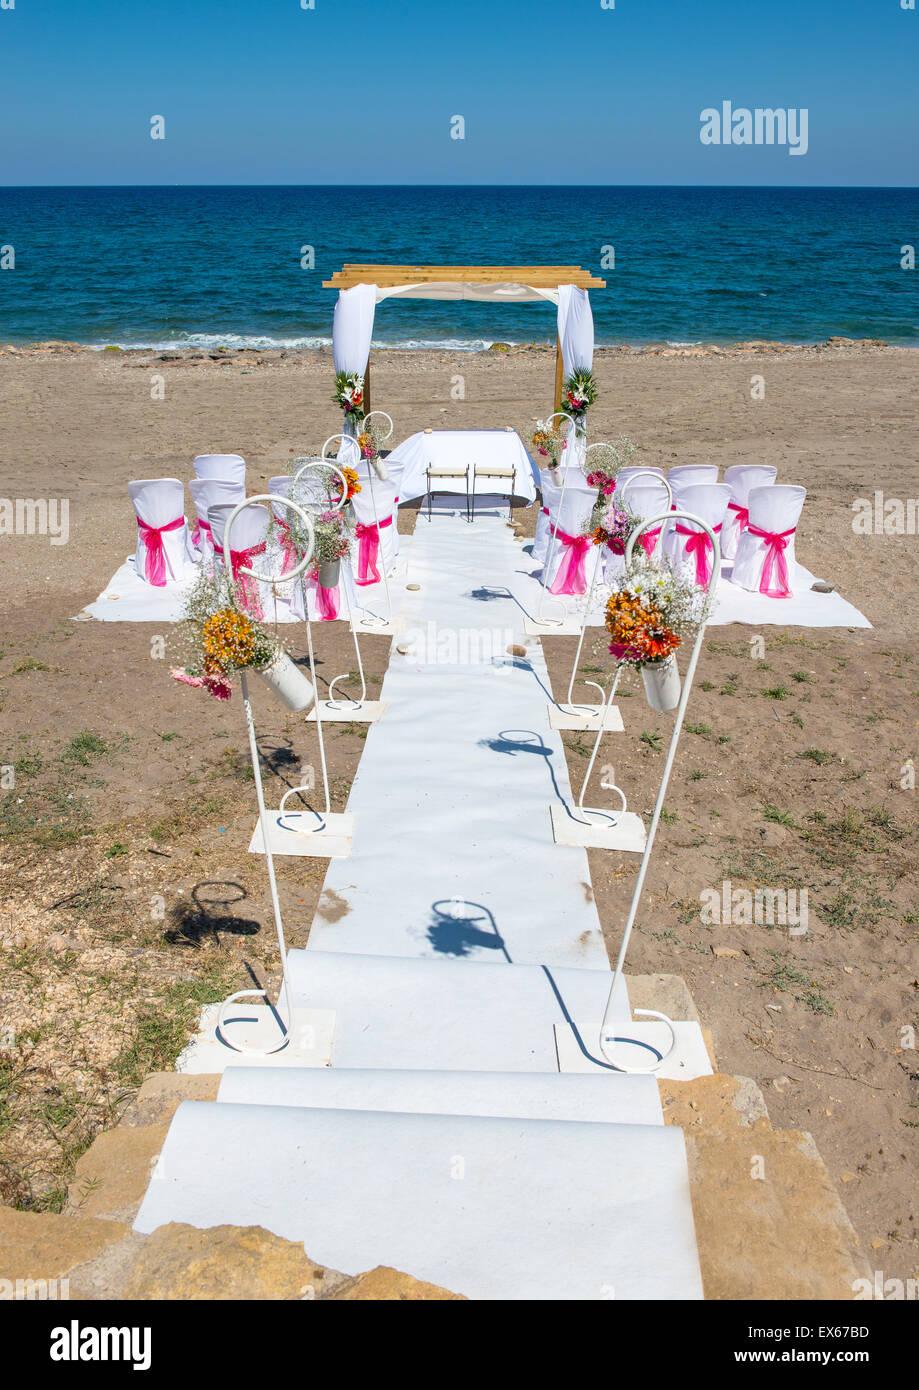 Beach Wedding Venue In Mojacar Almeria Province Andalusia Spain